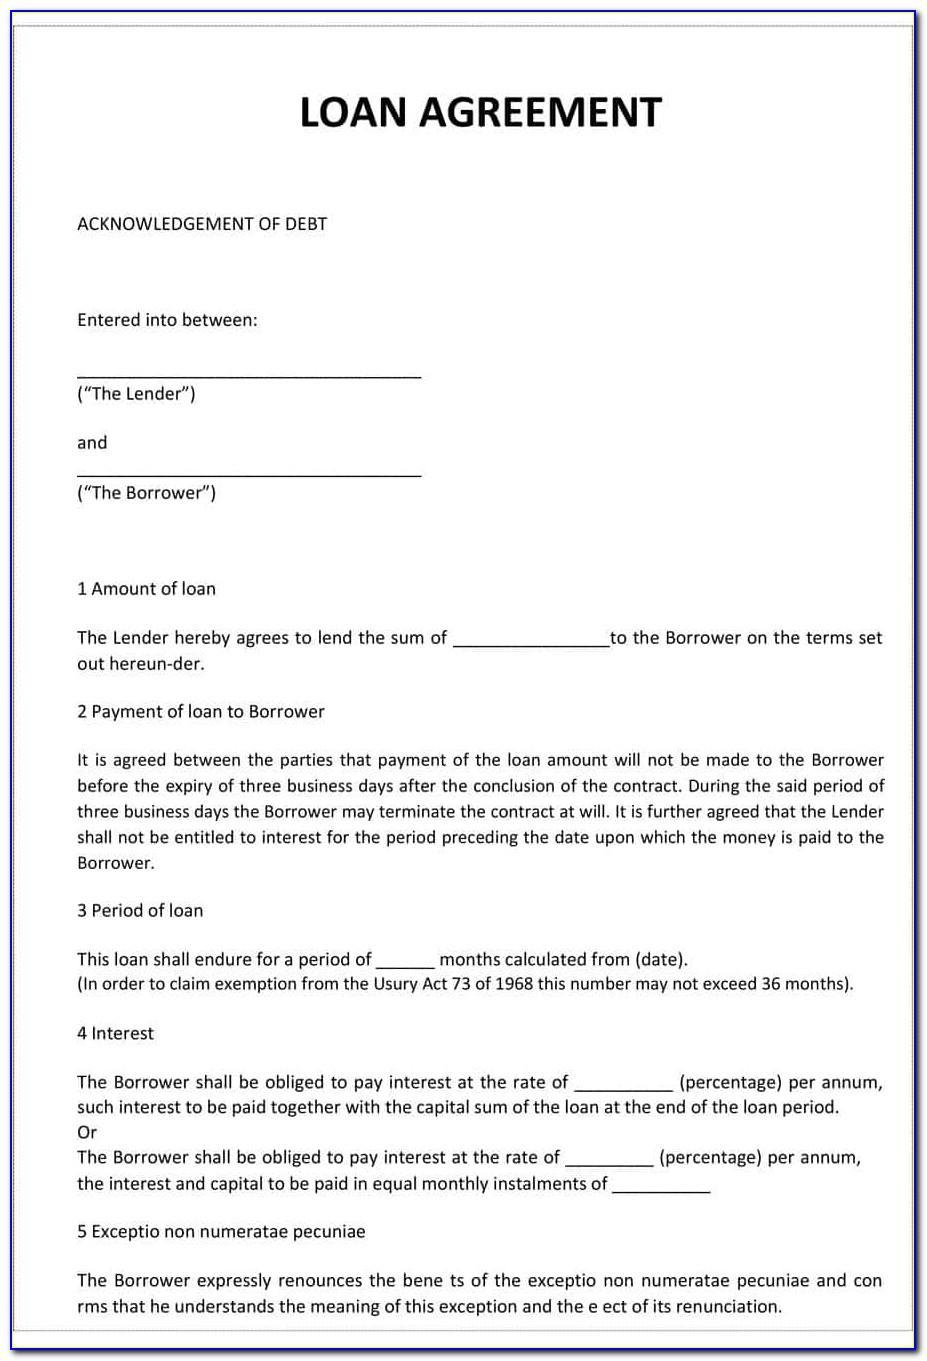 Free Loan Agreements Templates